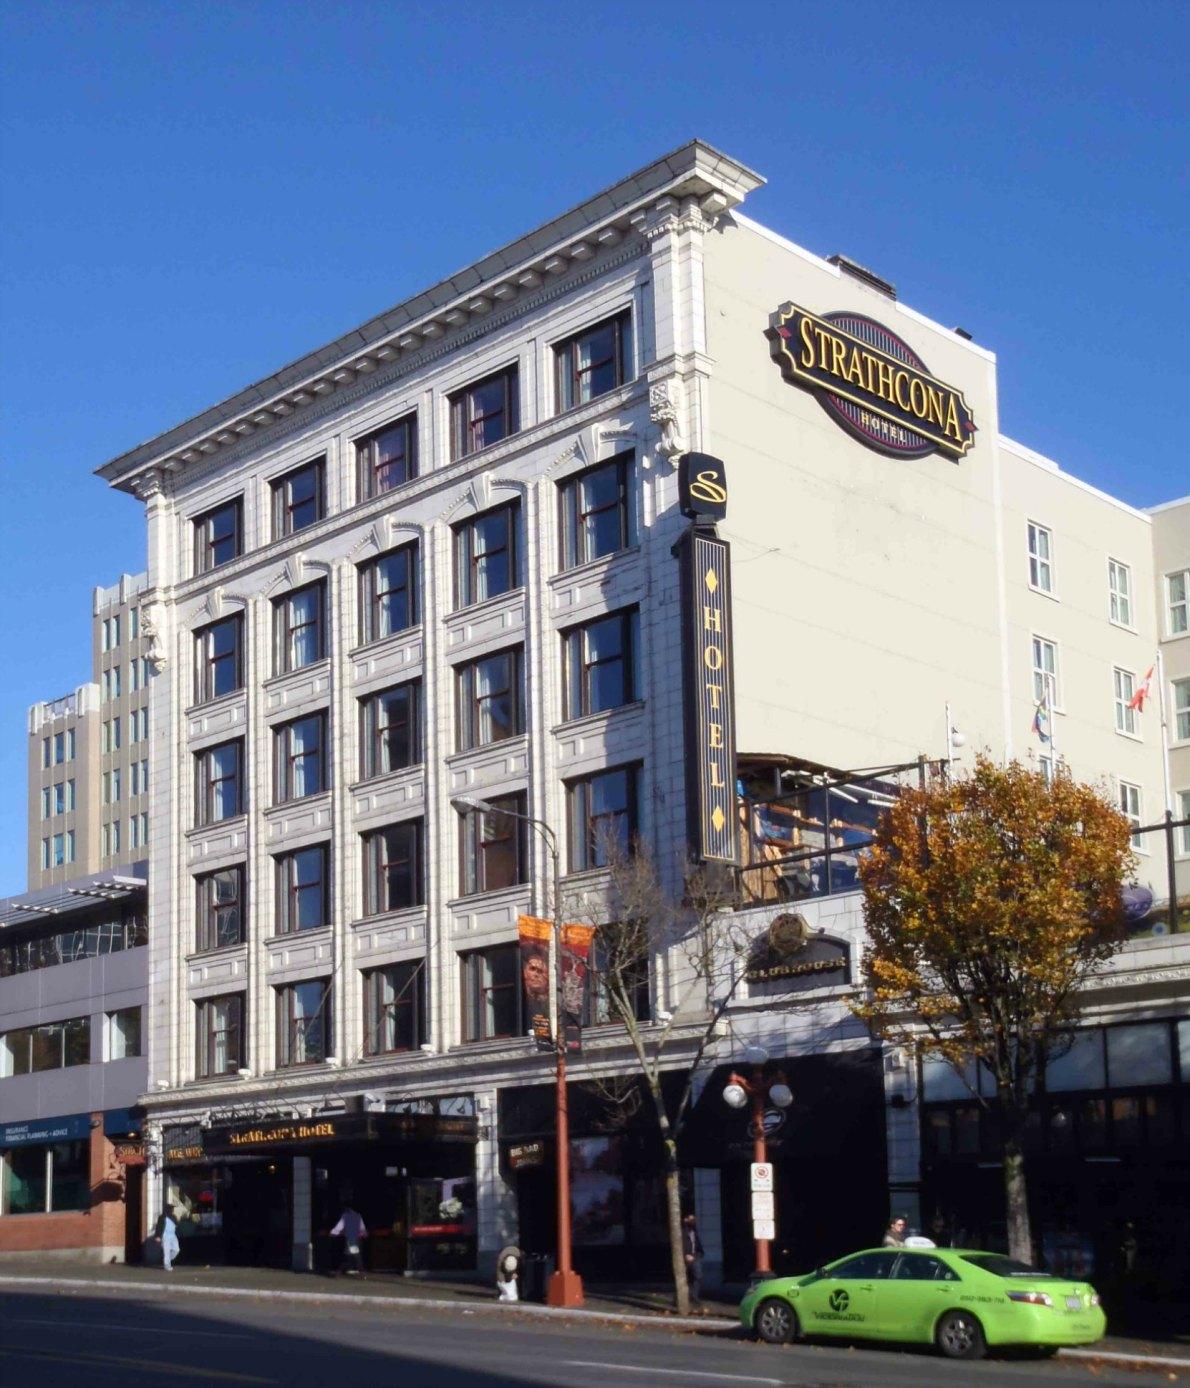 Strathcona Hotel, 919 Douglas Street. Built in 1911.